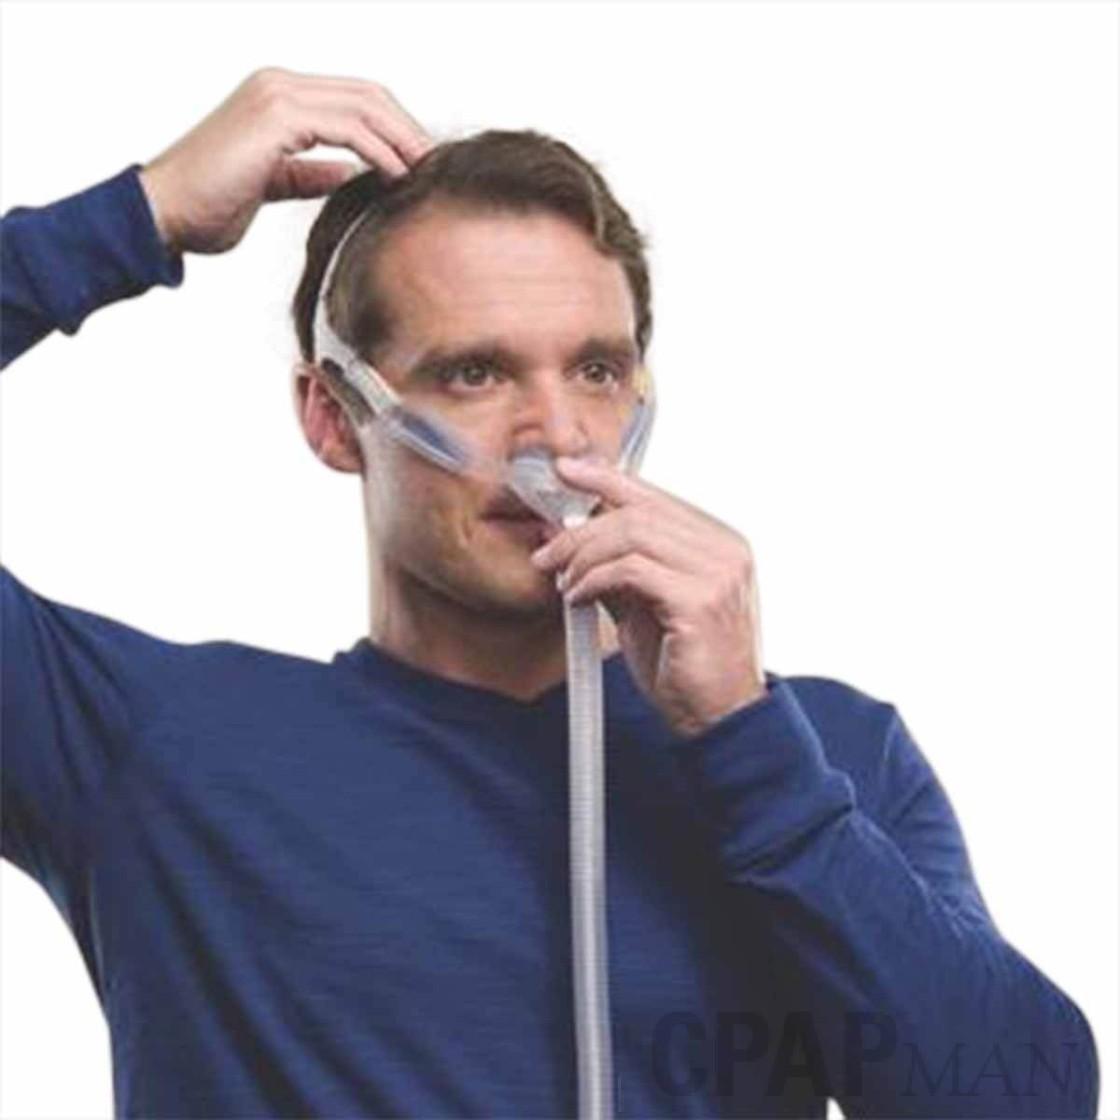 Respironics Nuance Gel Nasal Pillow CPAP Mask